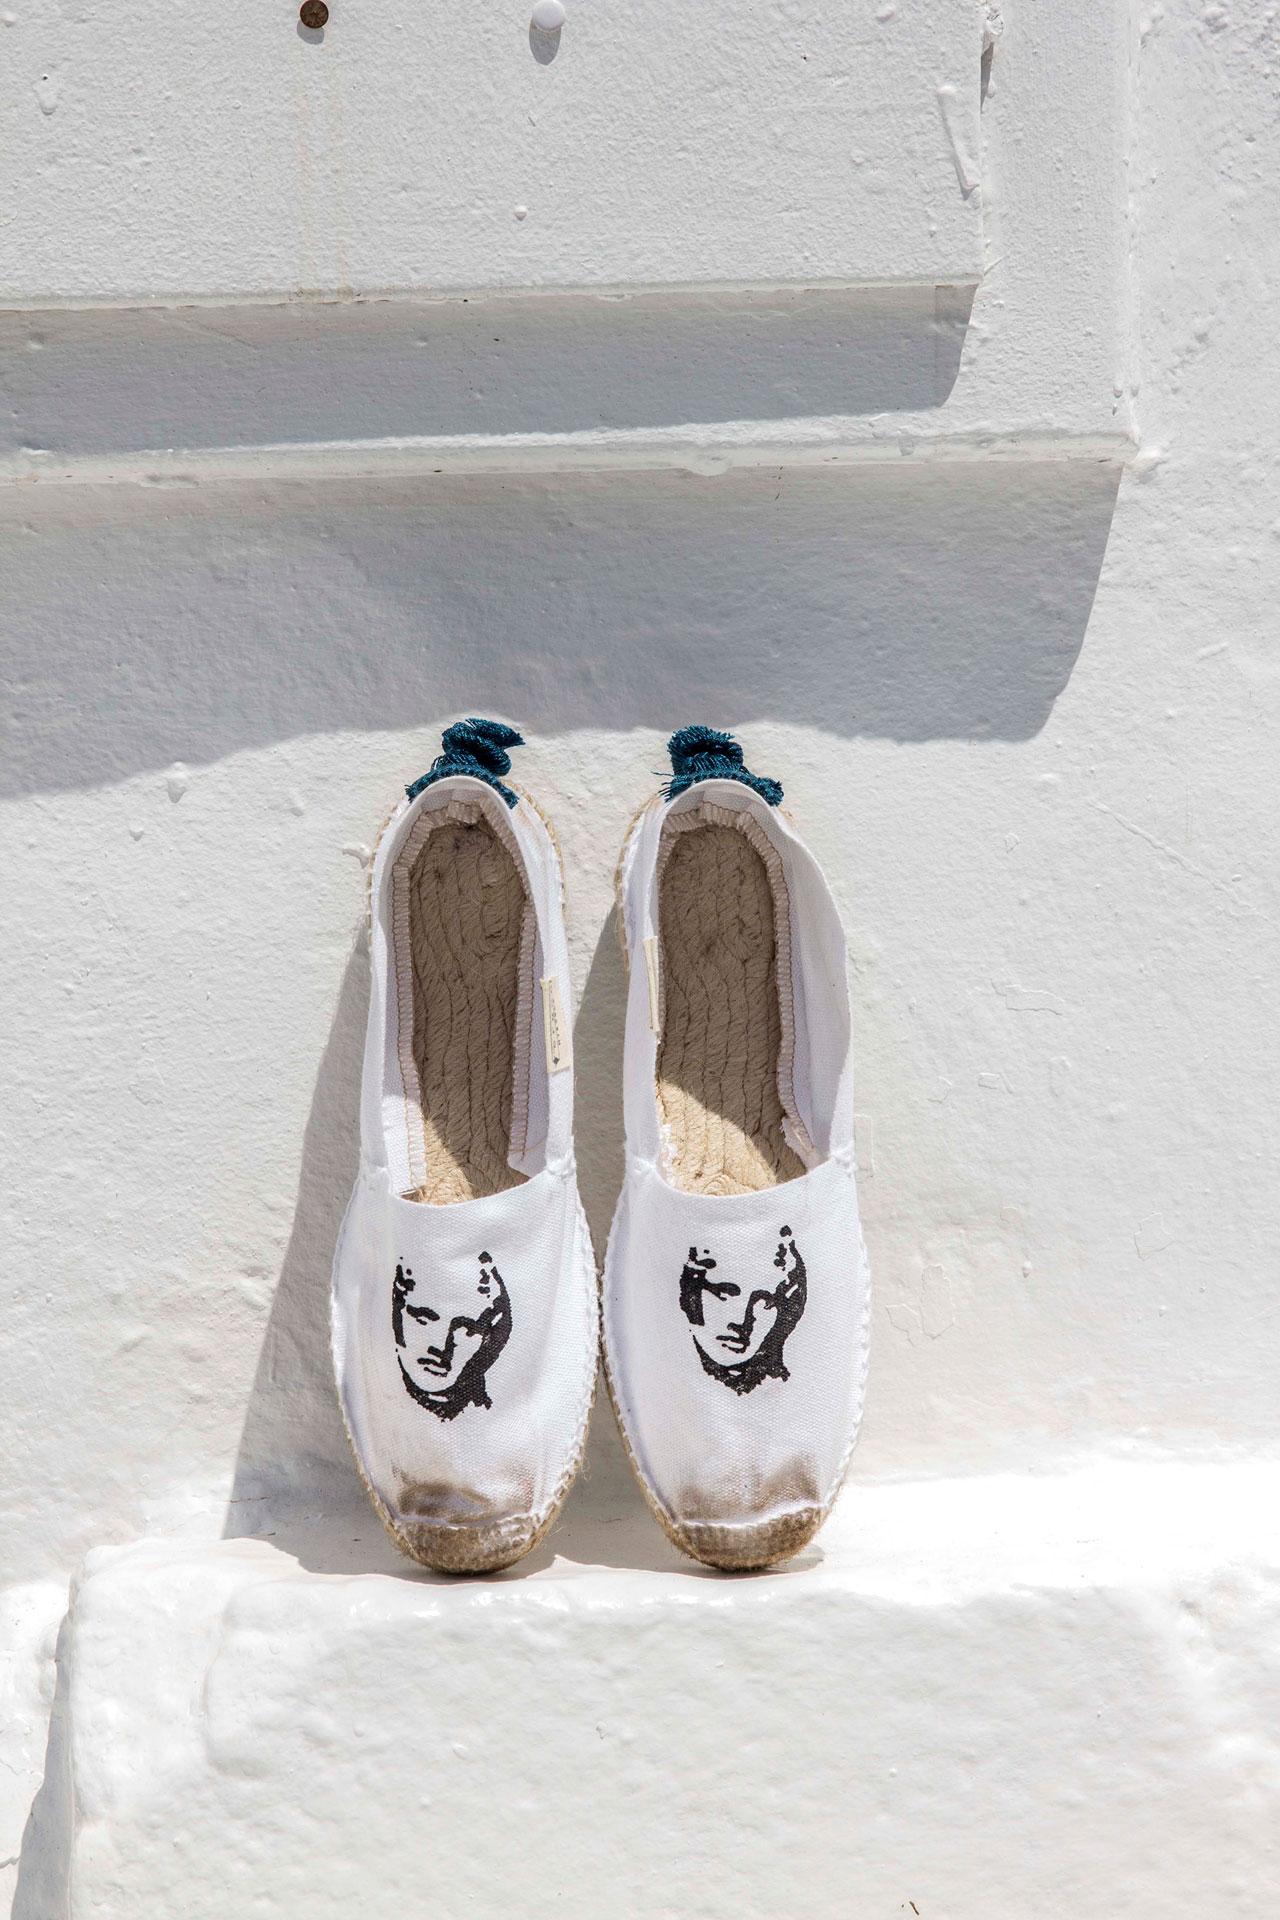 ERGON MYKONOS SS16 Footwear CollectionArt direction: George PavlakisPhotographer: Kwnstantinos MalekakisMake up artist & Hair: Elena PsomaModels: Antigoni Tantsi & Theresa (d.models)